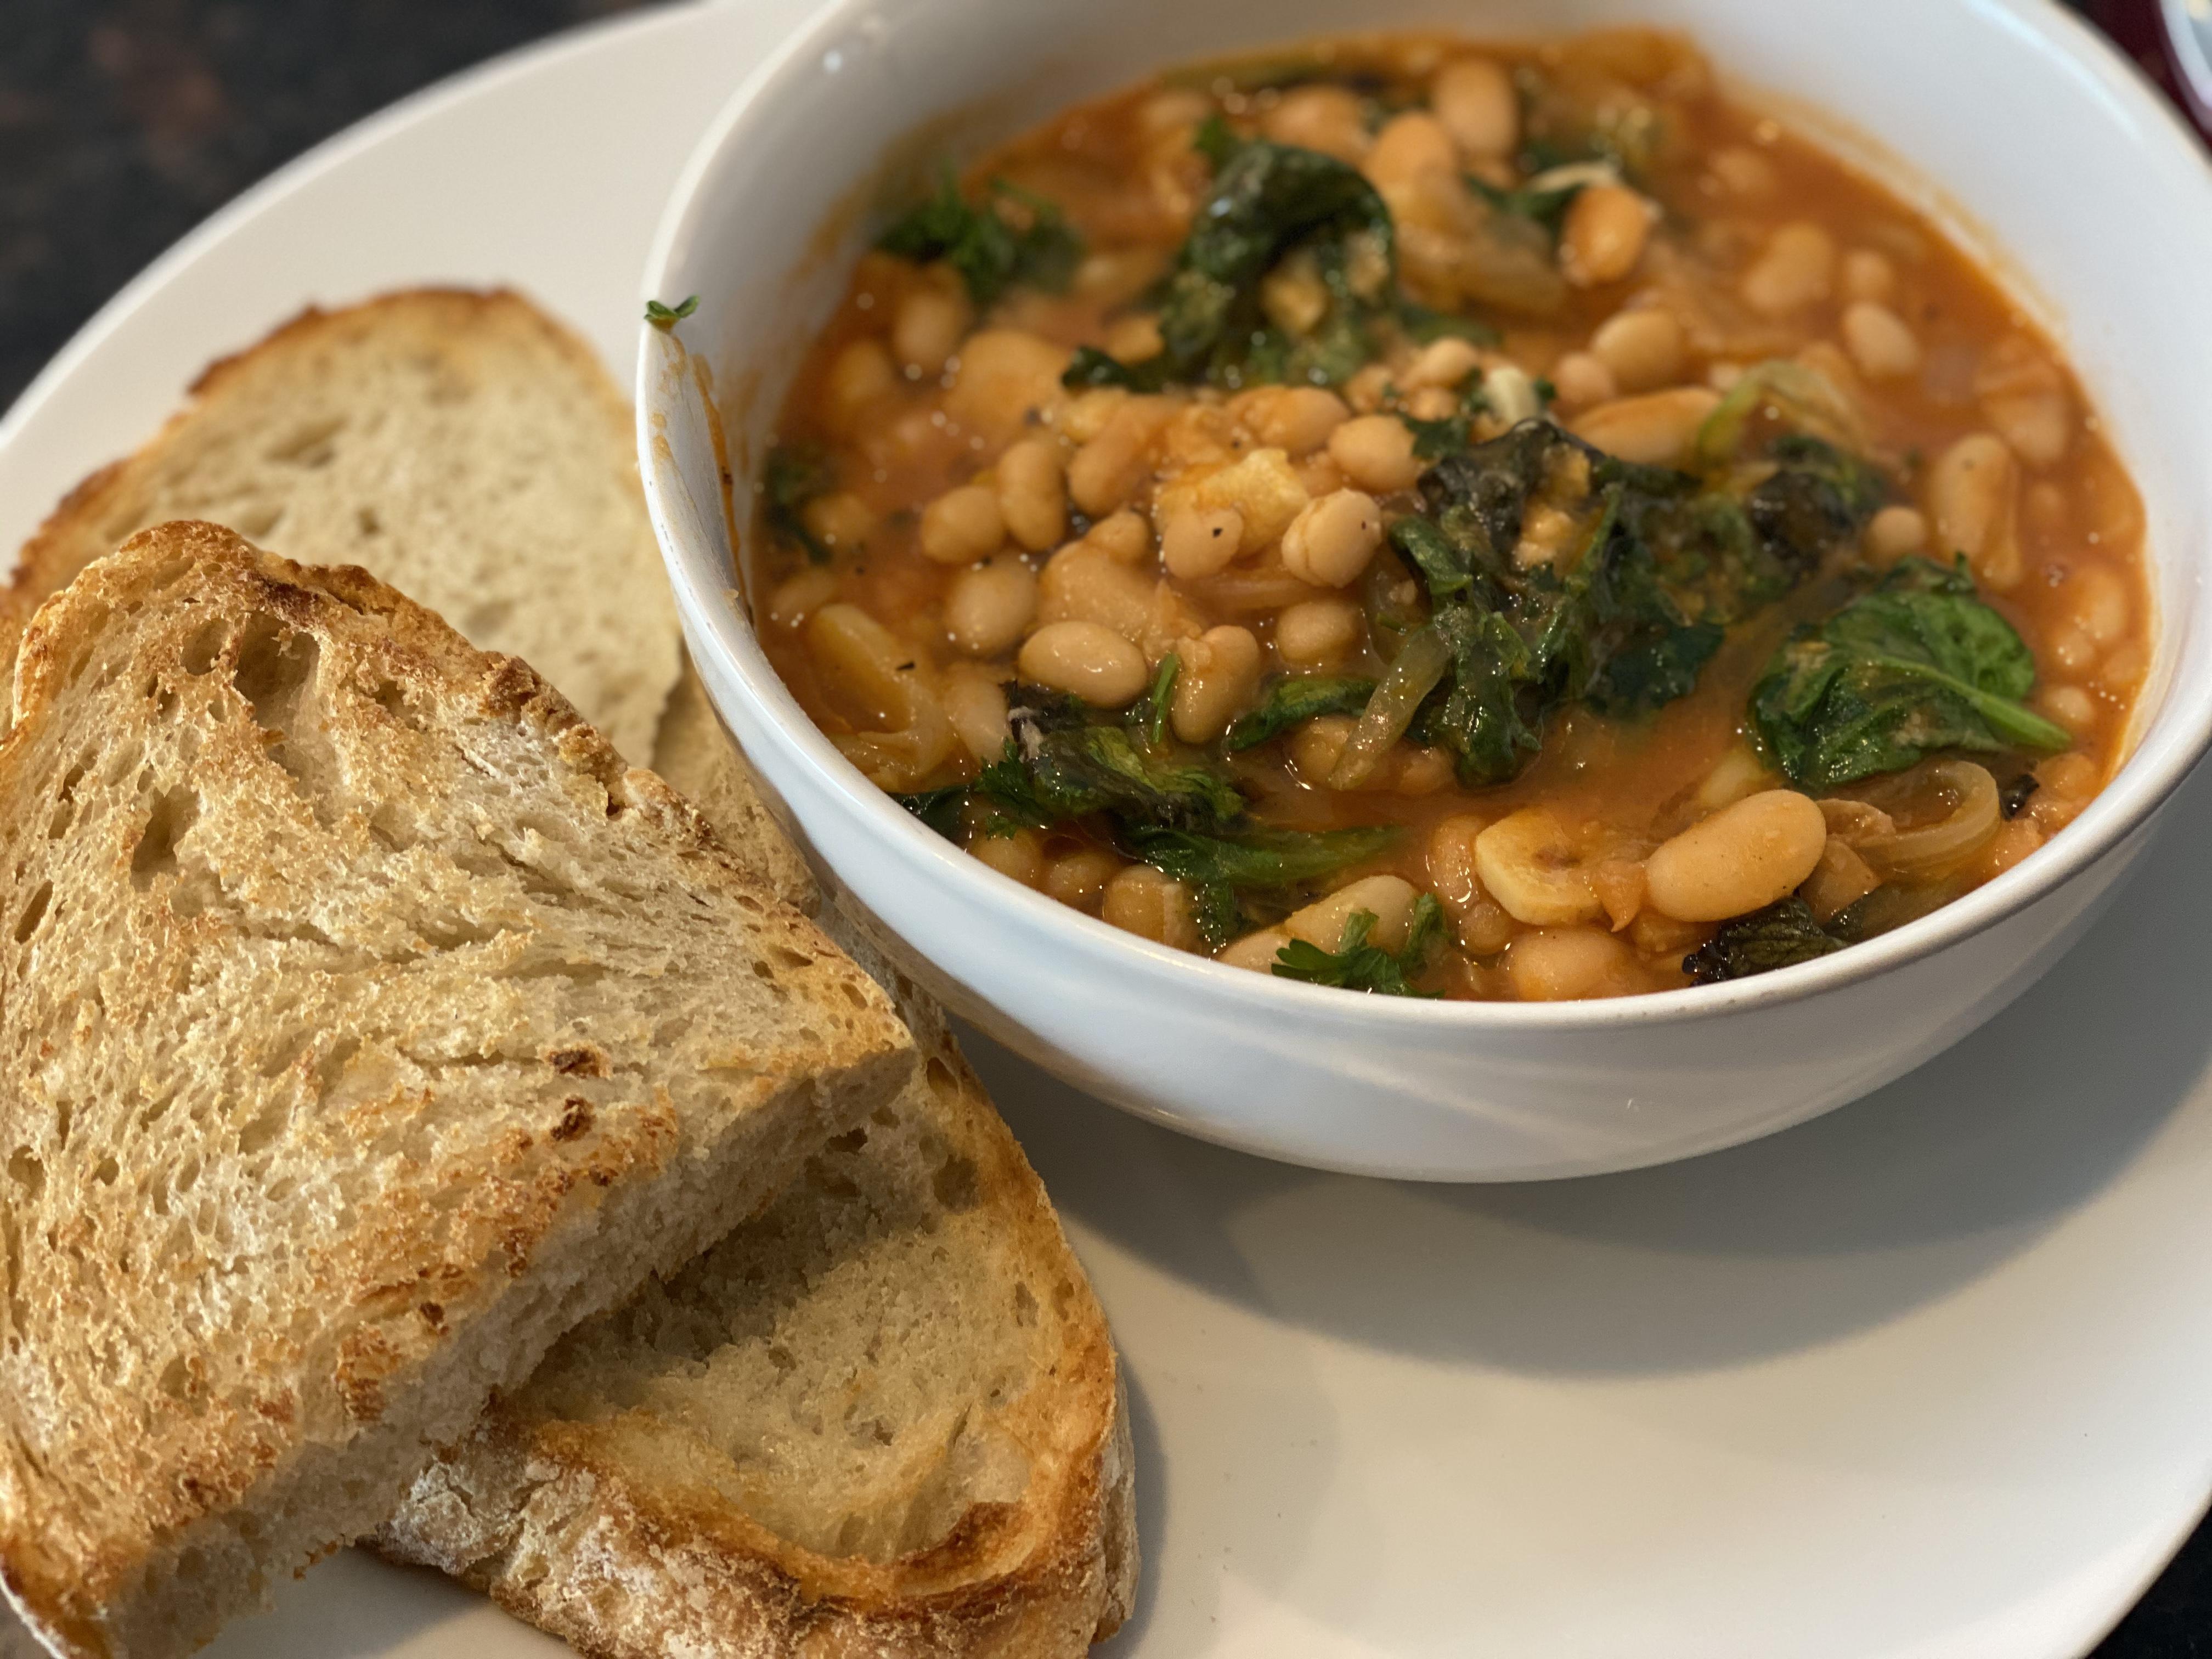 Alison's Roman Spicy Bean Stew